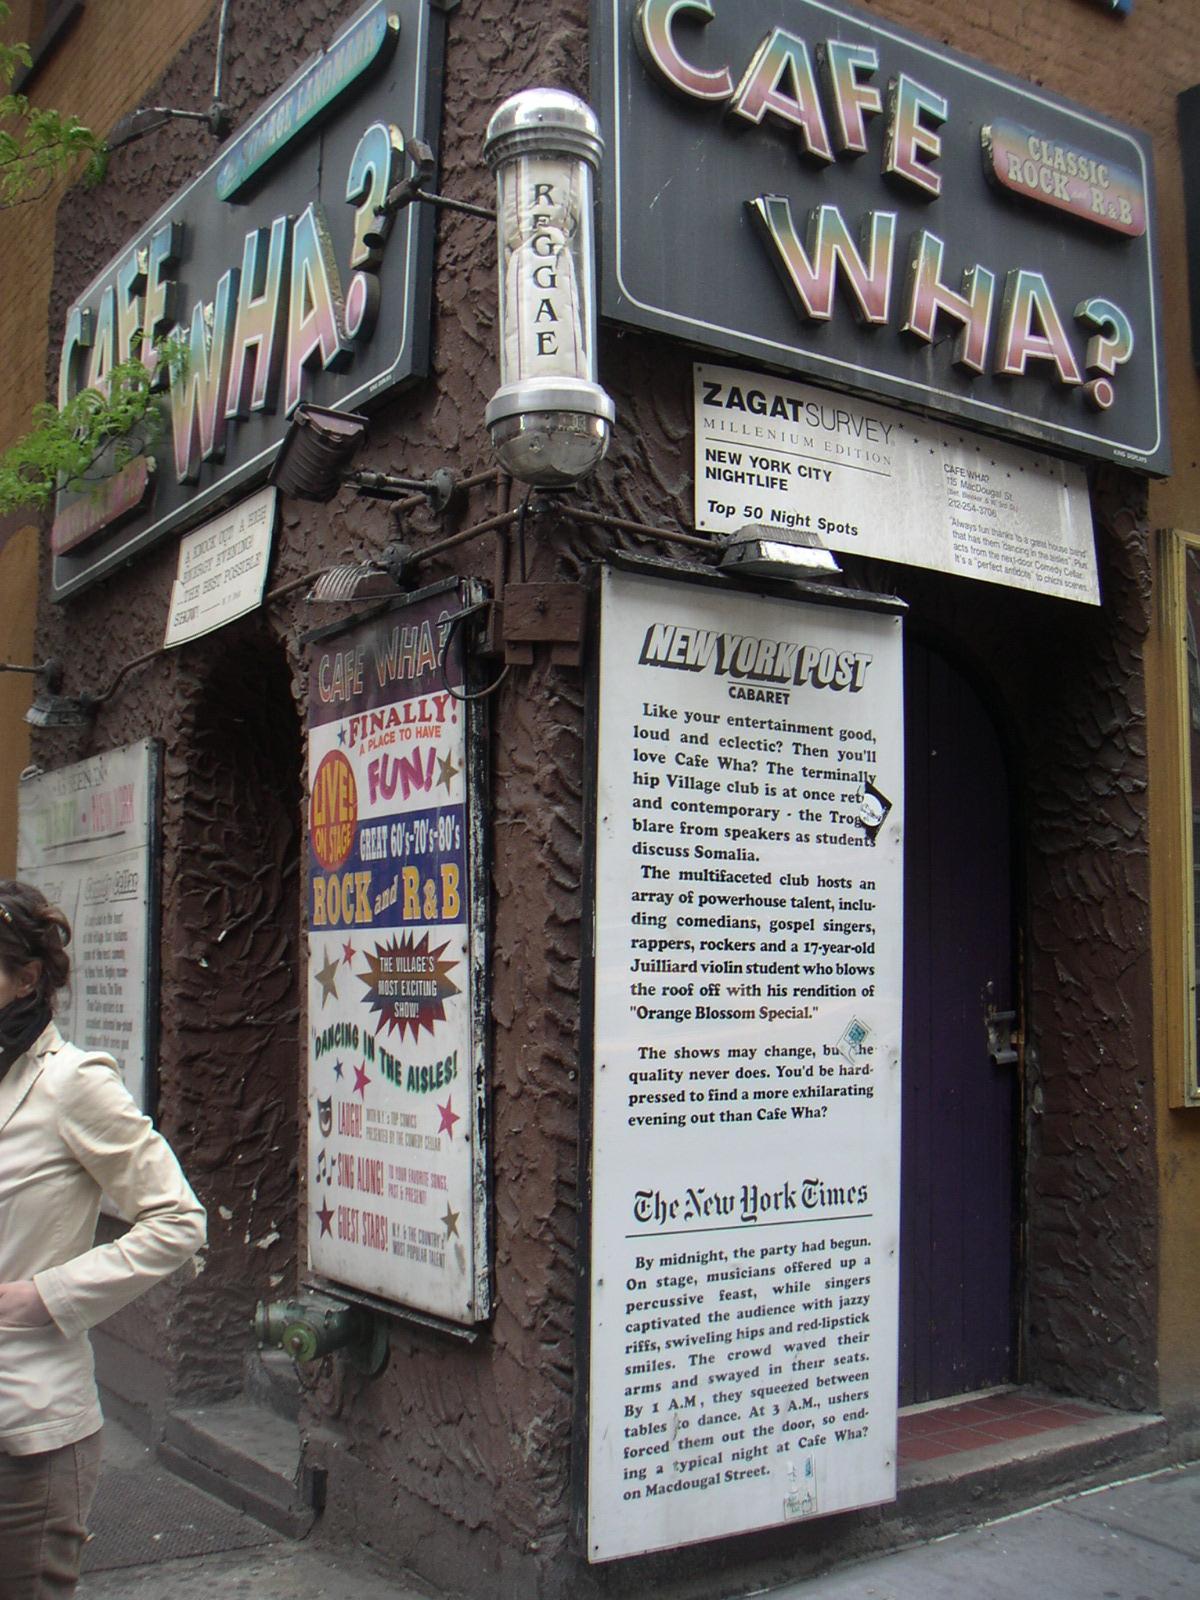 Cafe Wha Wikipedia